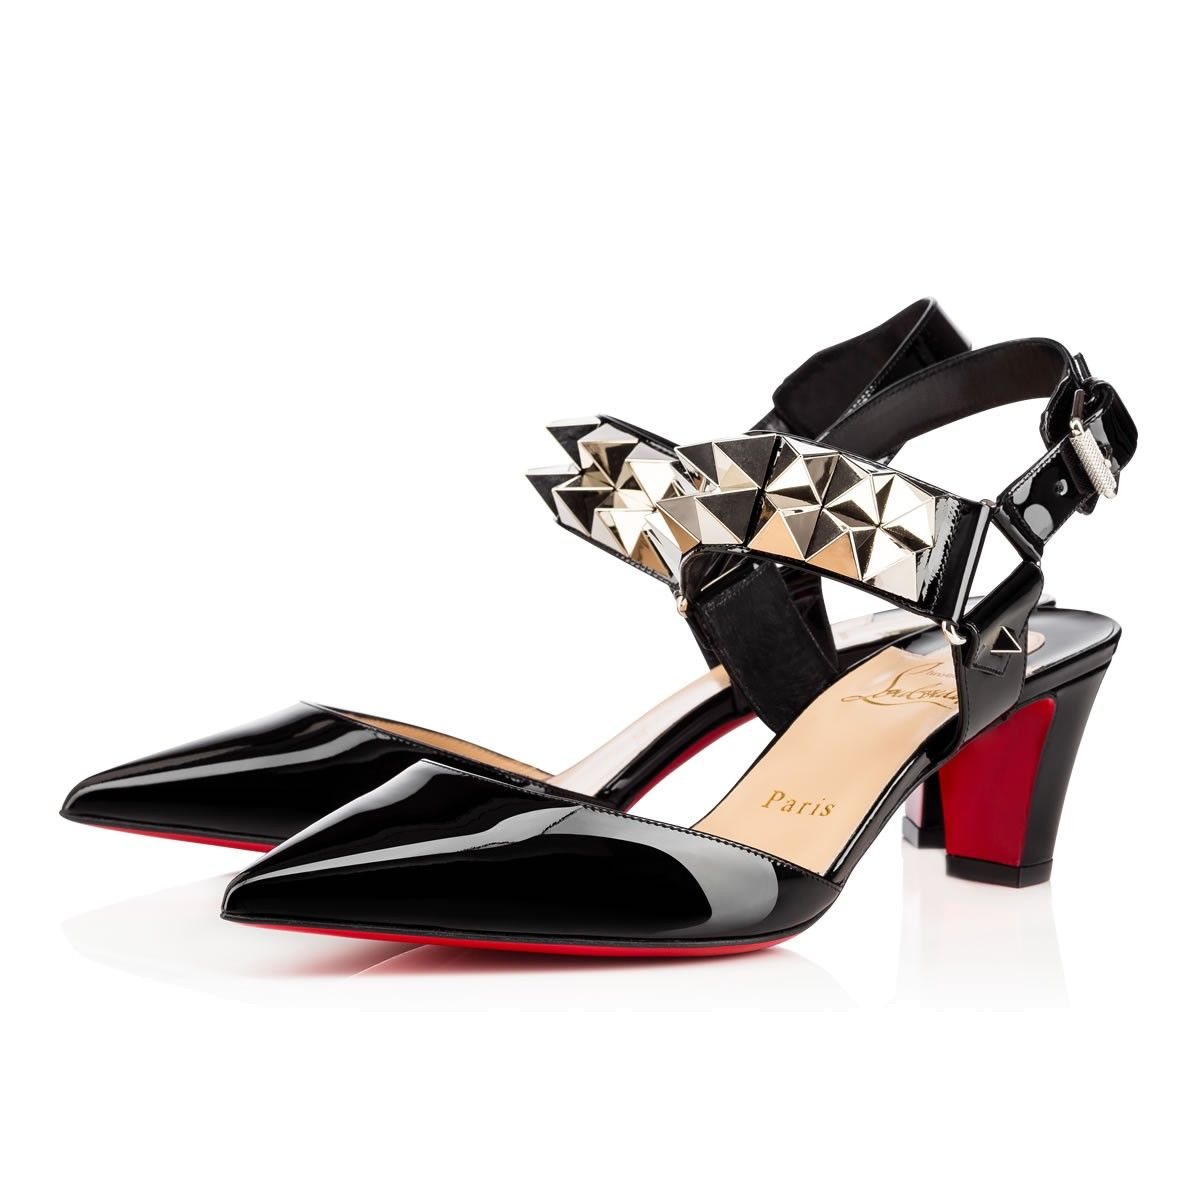 a945f758fdb1 CHRISTIAN LOUBOUTIN Ziggoo 55 Black Silver Patent Leather - Women Shoes - Christian  Louboutin.